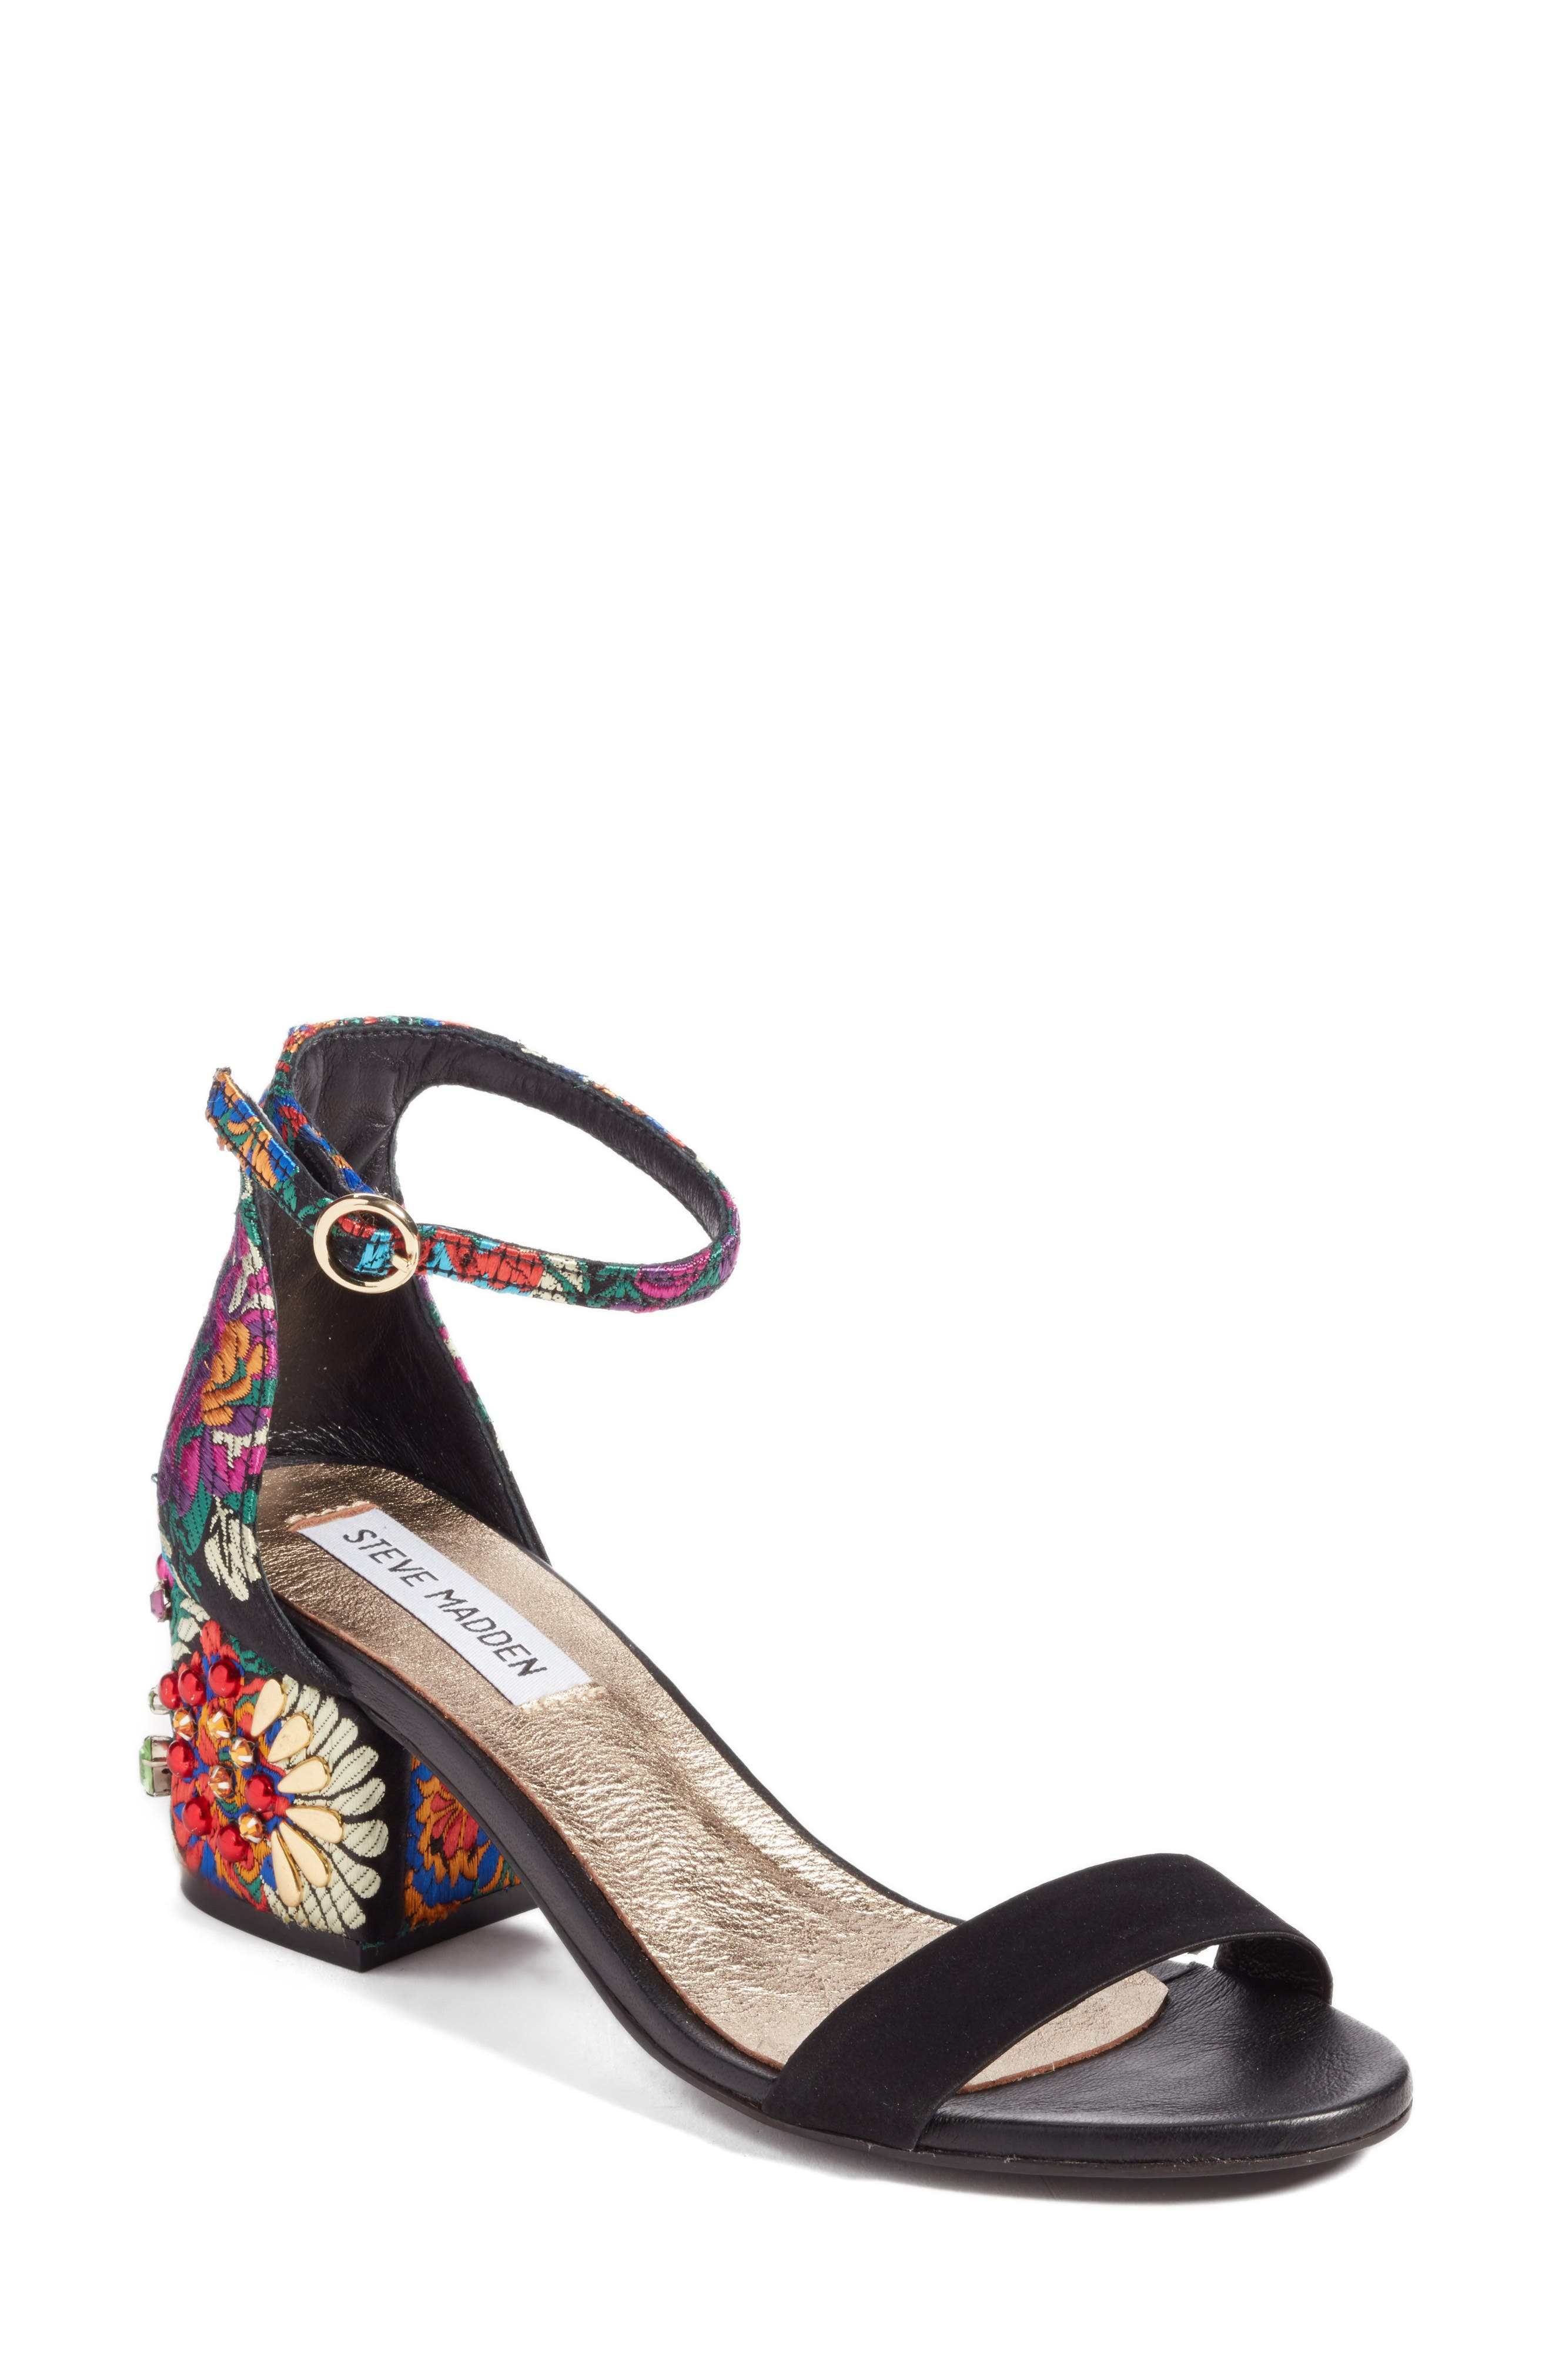 Inca Sandal,                             Main thumbnail 1, color,                             001